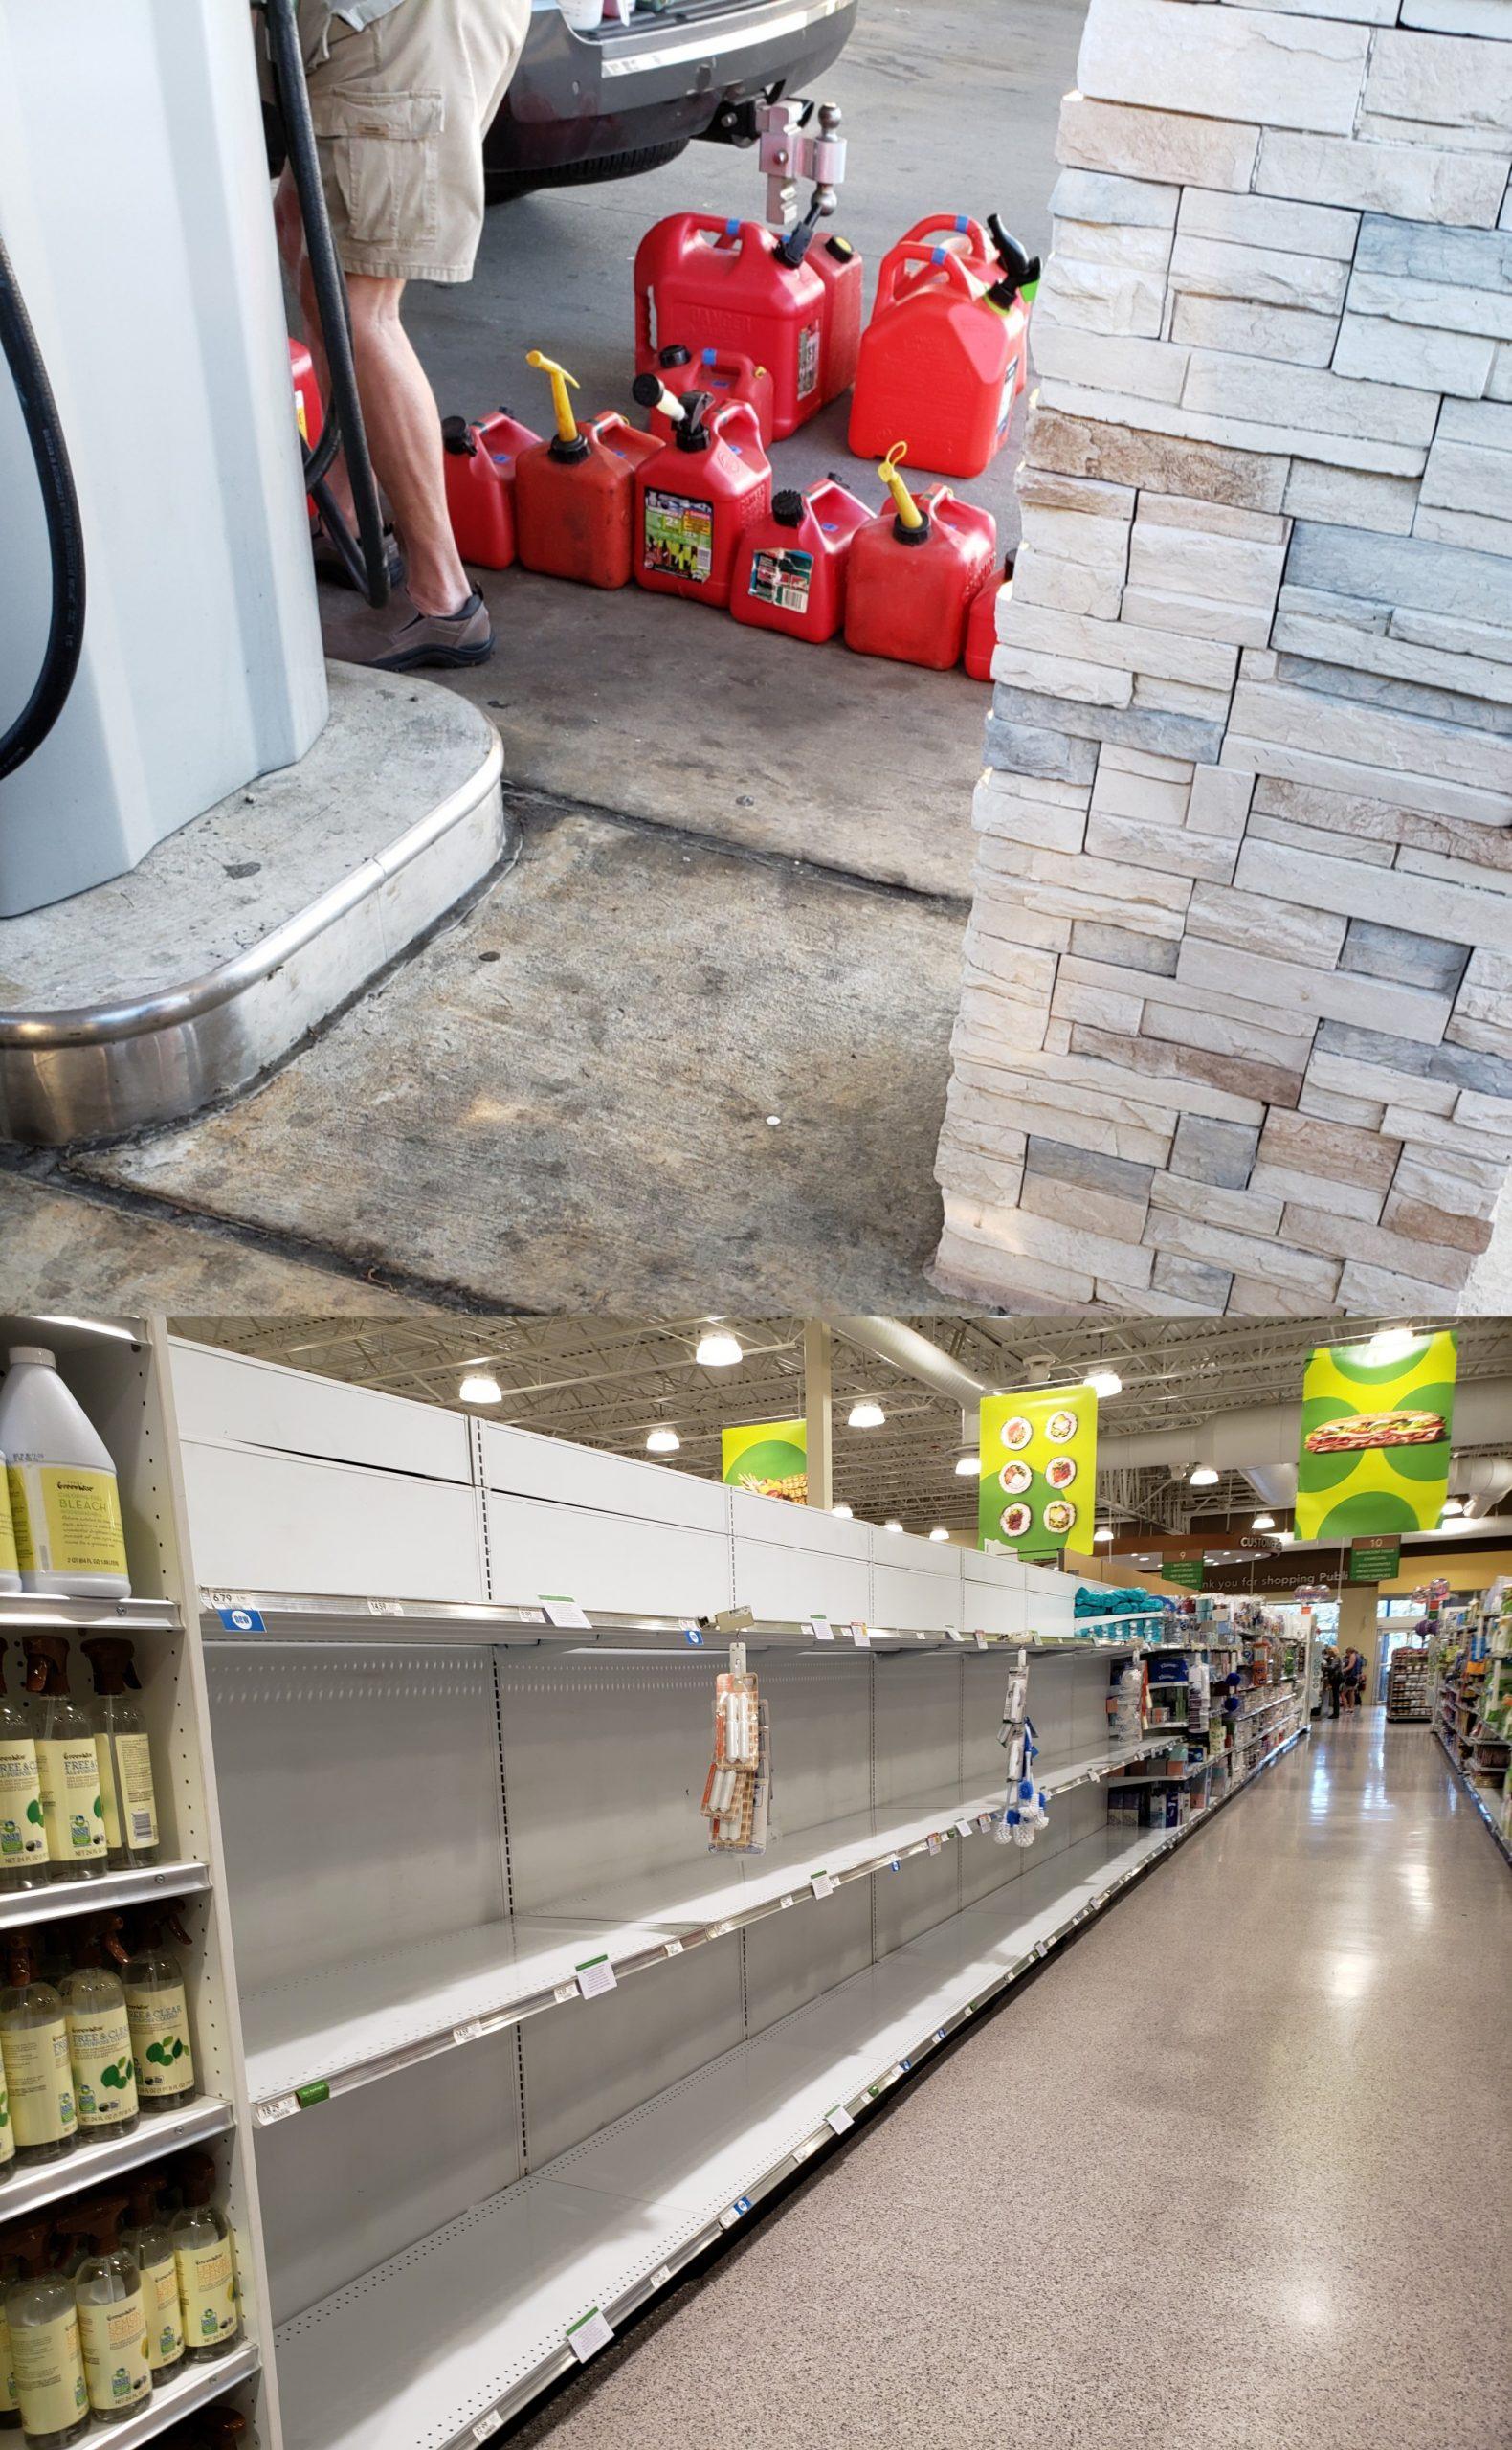 coronavirus panic, ocala news, toilet paper shortage